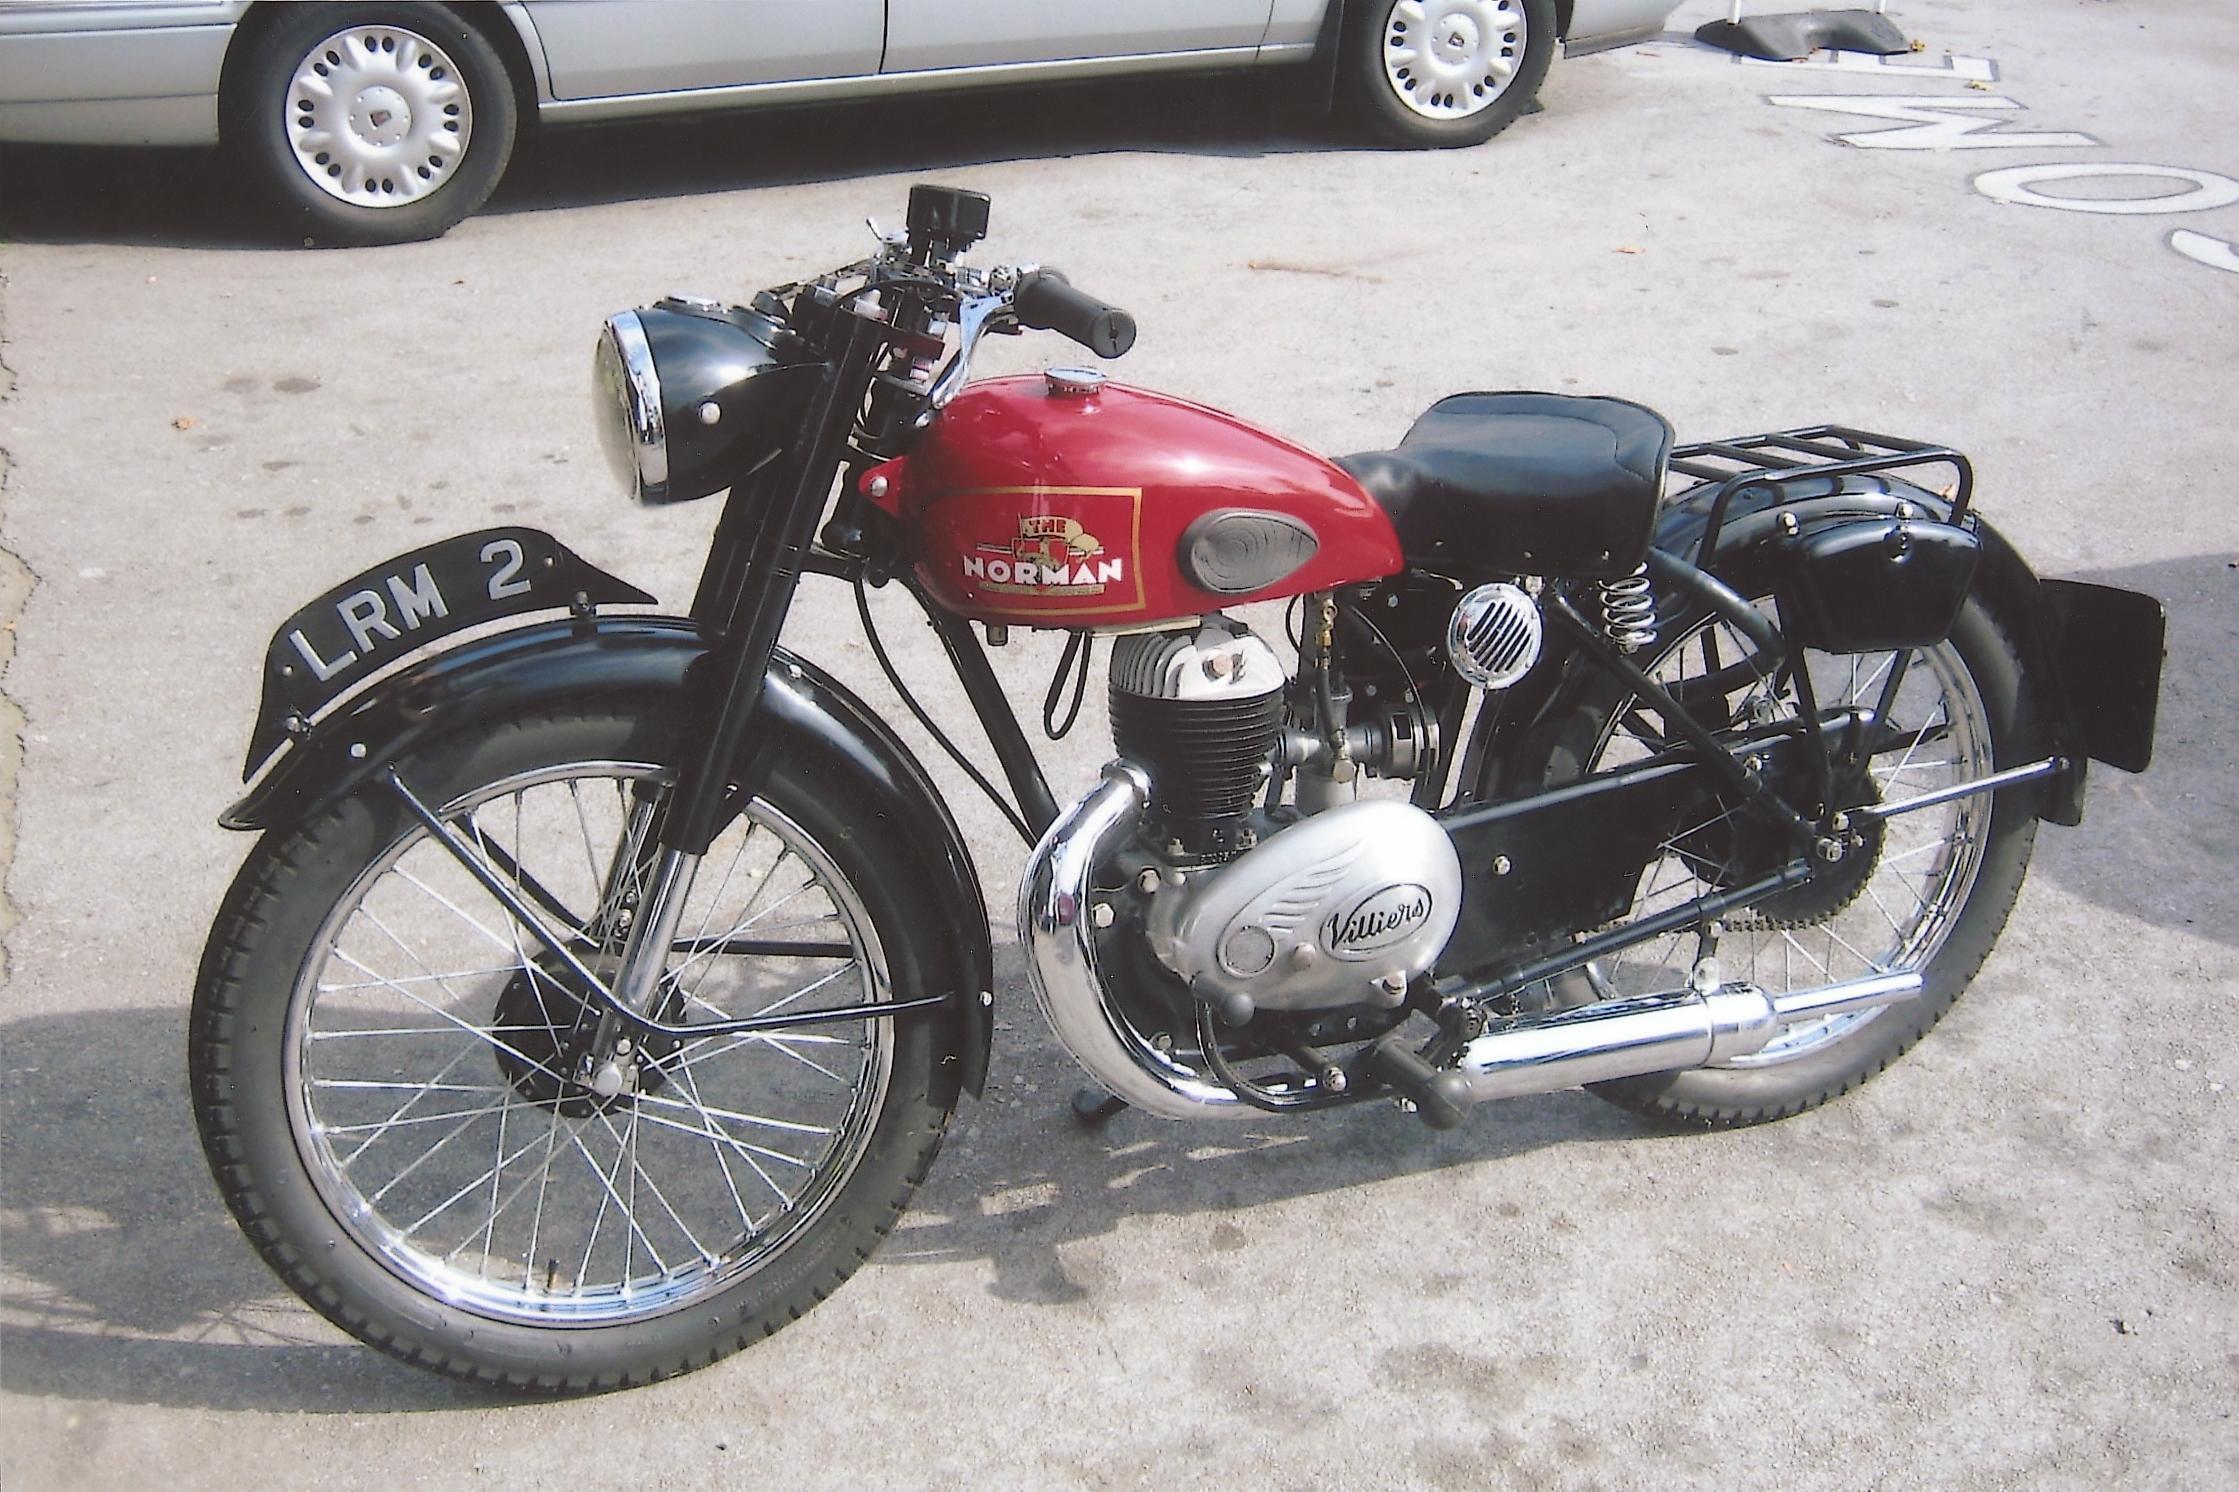 Auktion - Classic & Motorcycle Mechanics Show am 21 10 2006